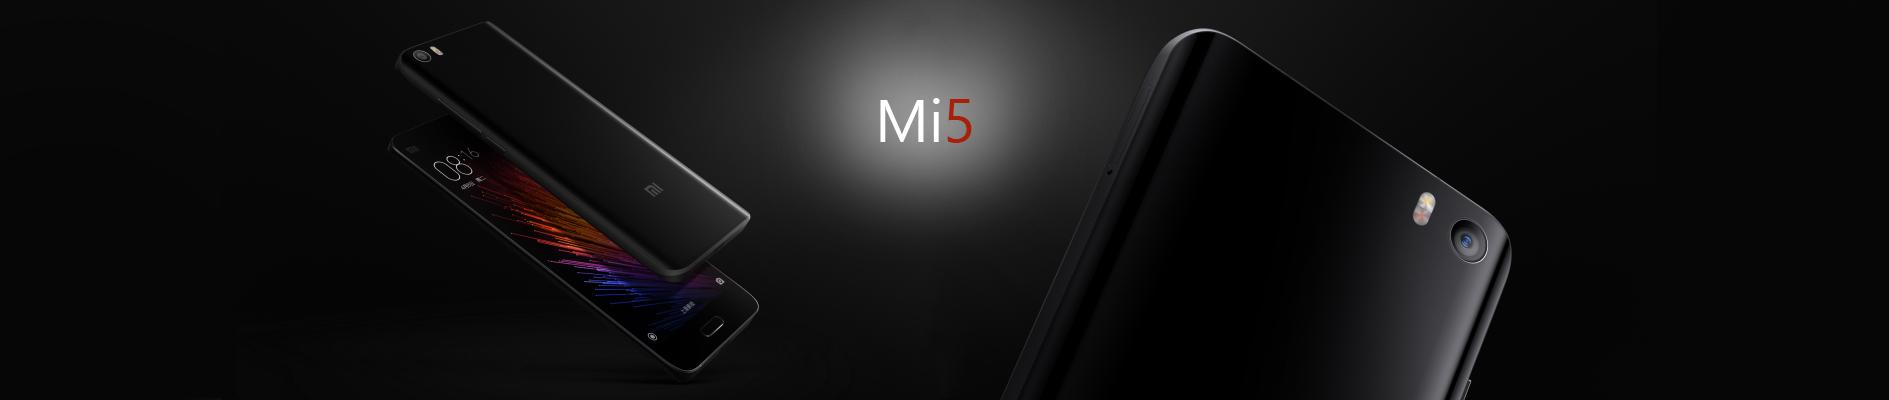 Mi5-Slide